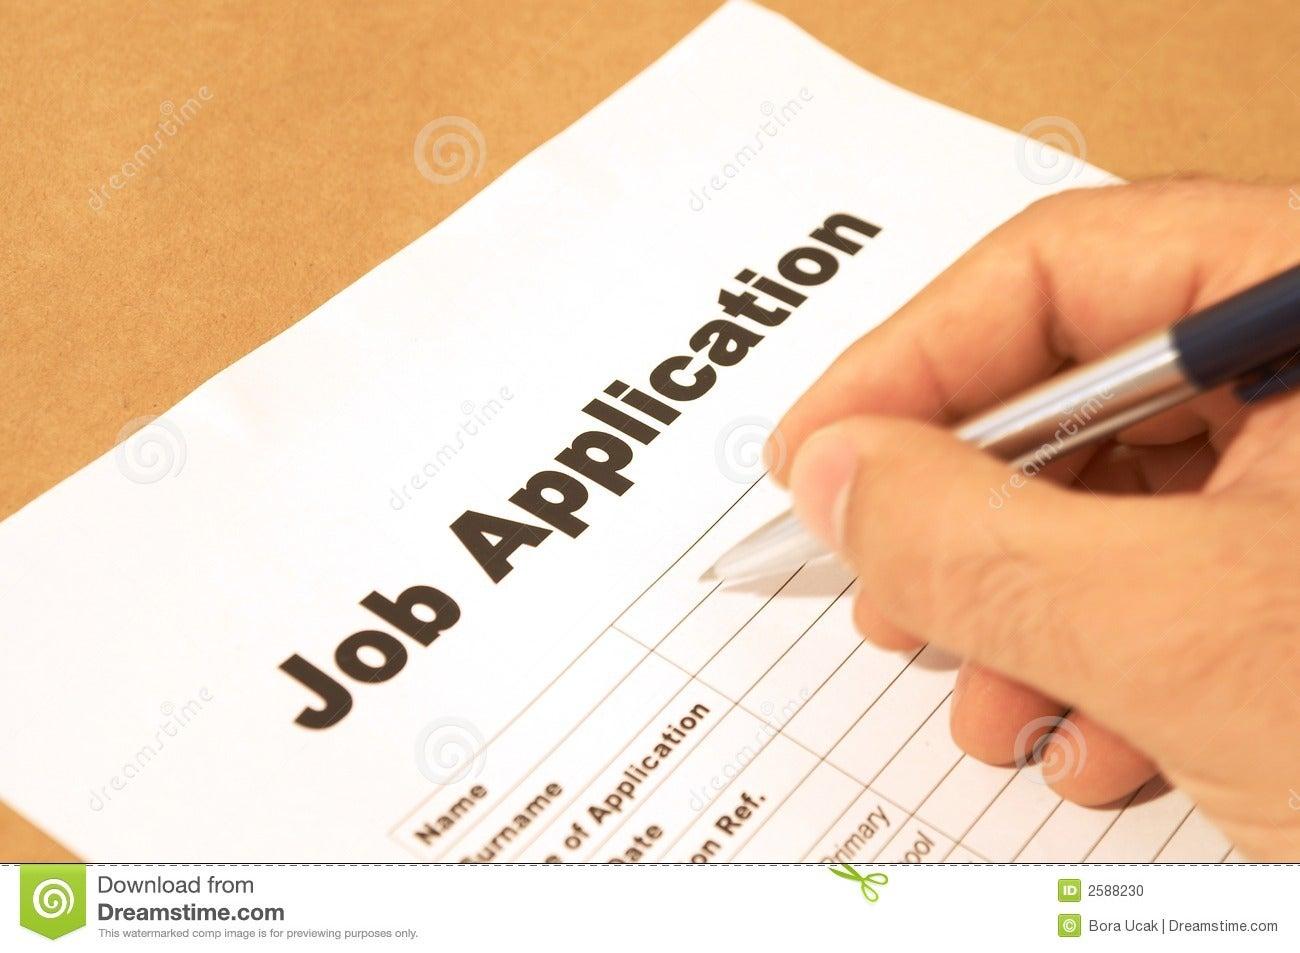 Applying for the job vanessa luna 7